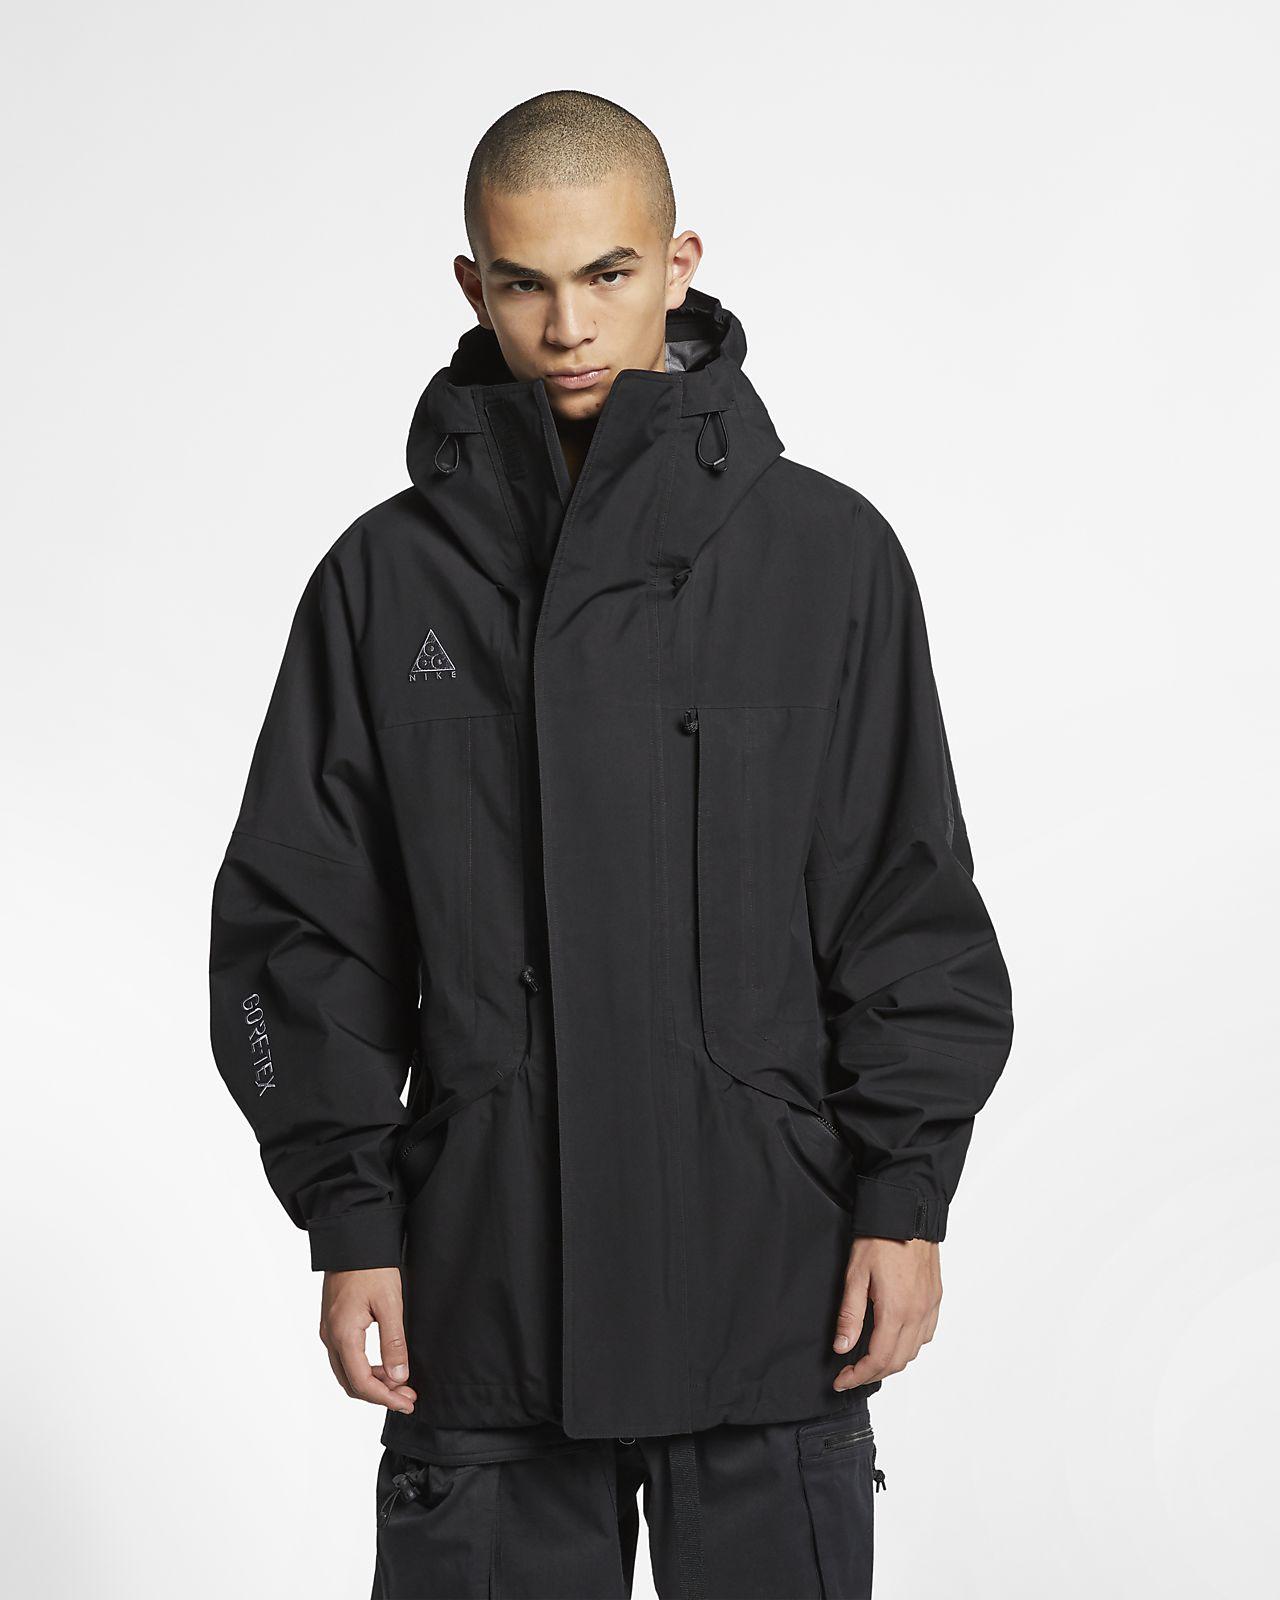 dd18ce0ba2a5 Nike ACG GORE-TEX® Men s Jacket. Nike.com CA